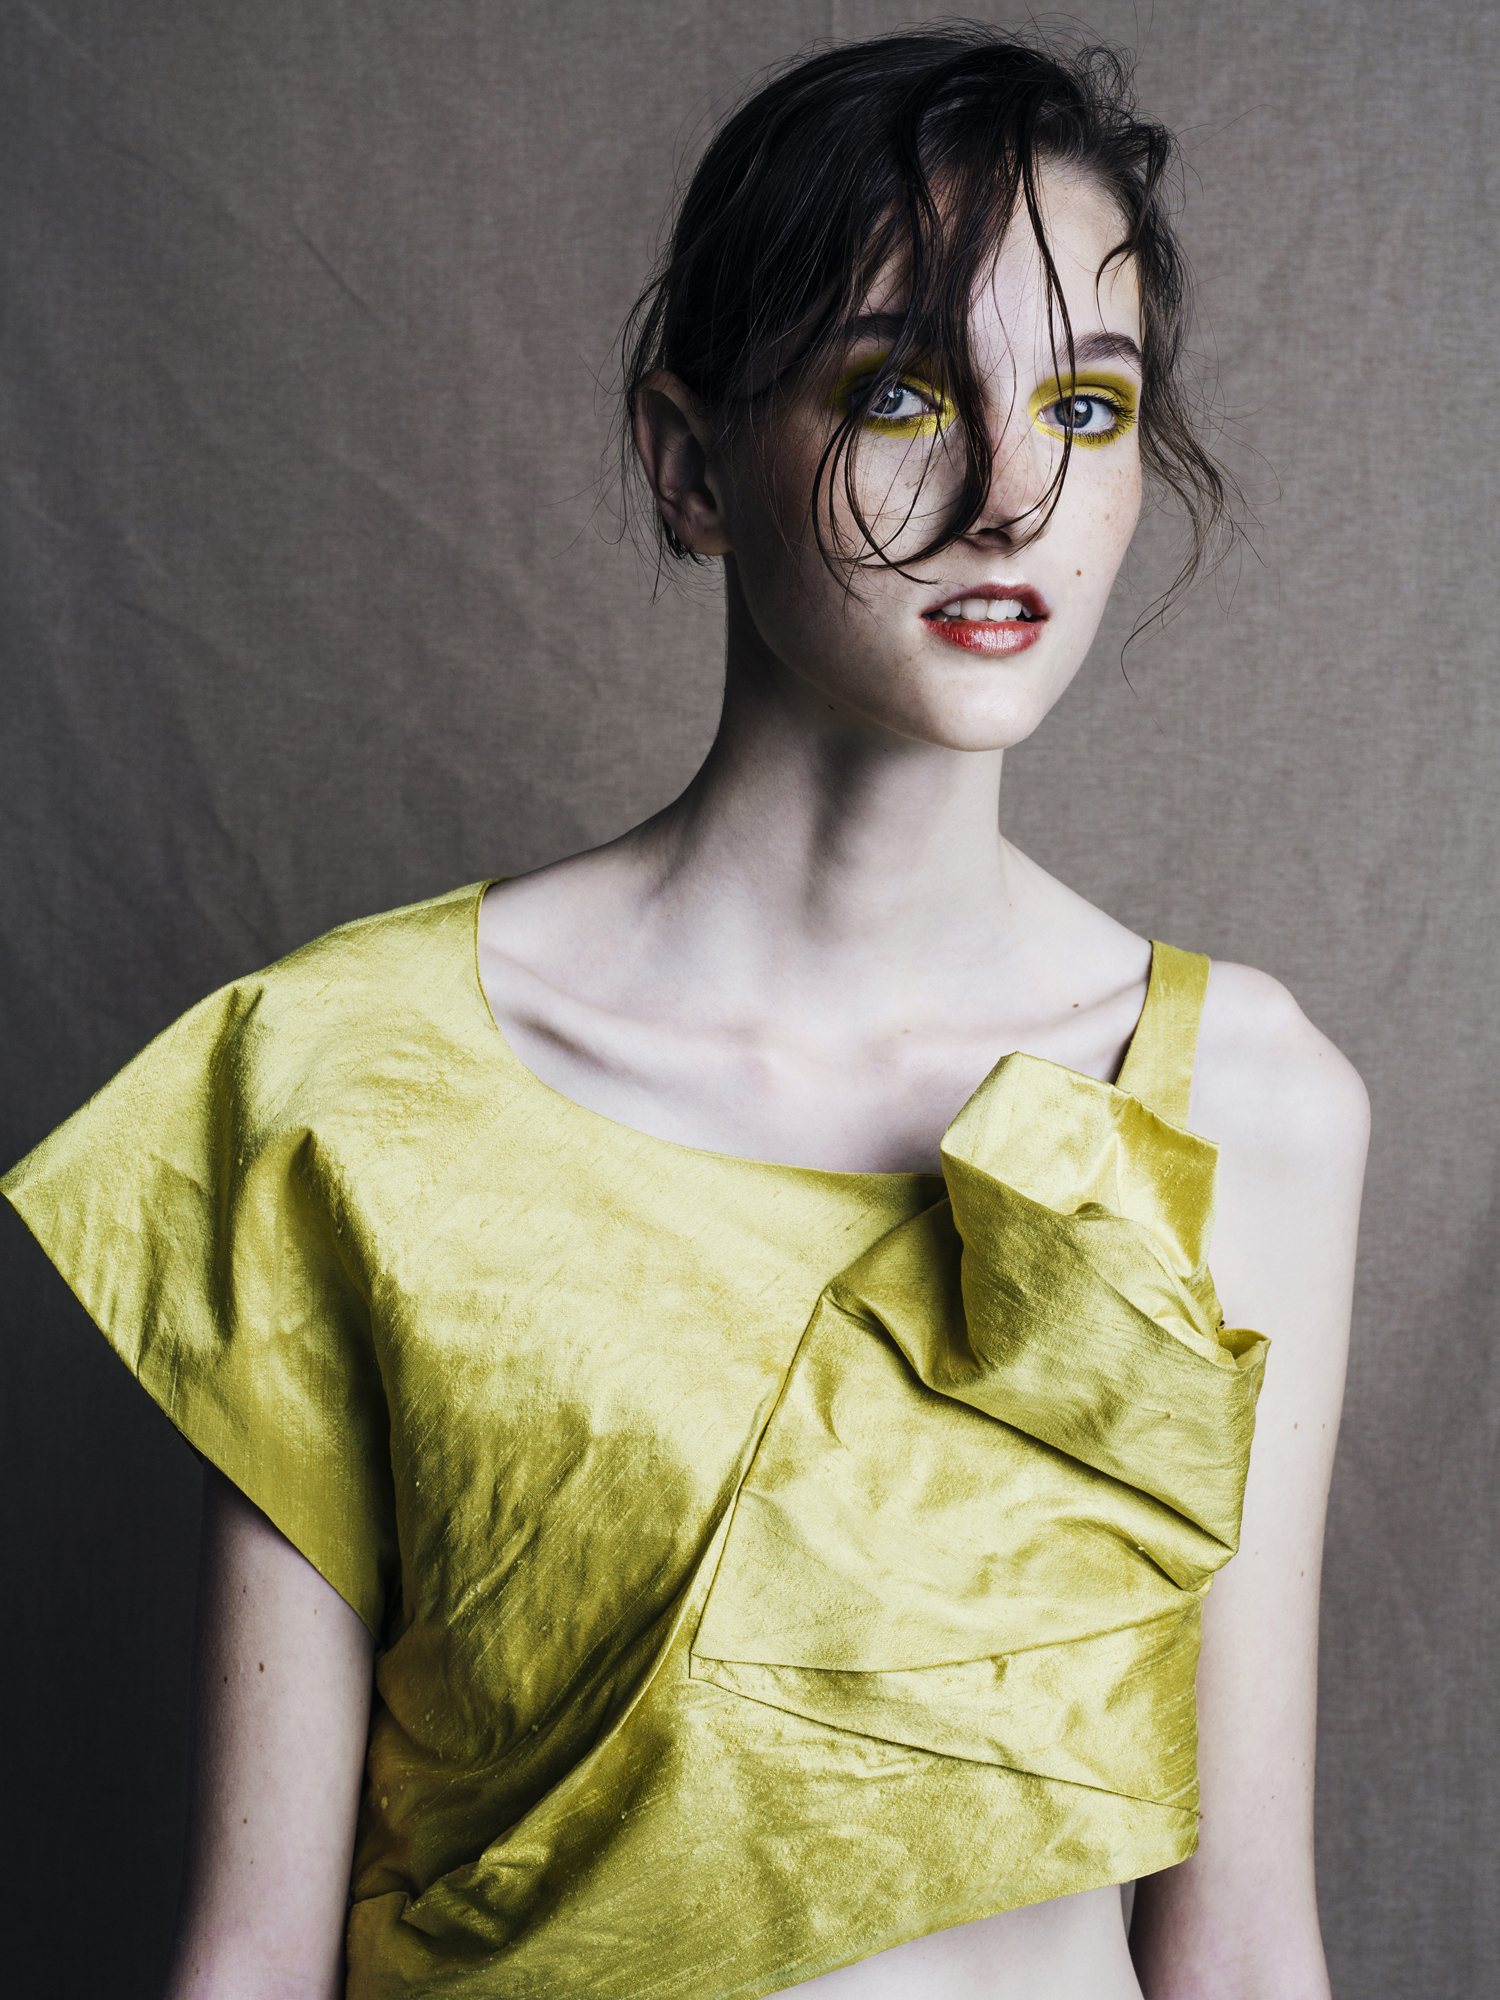 Yellowsm